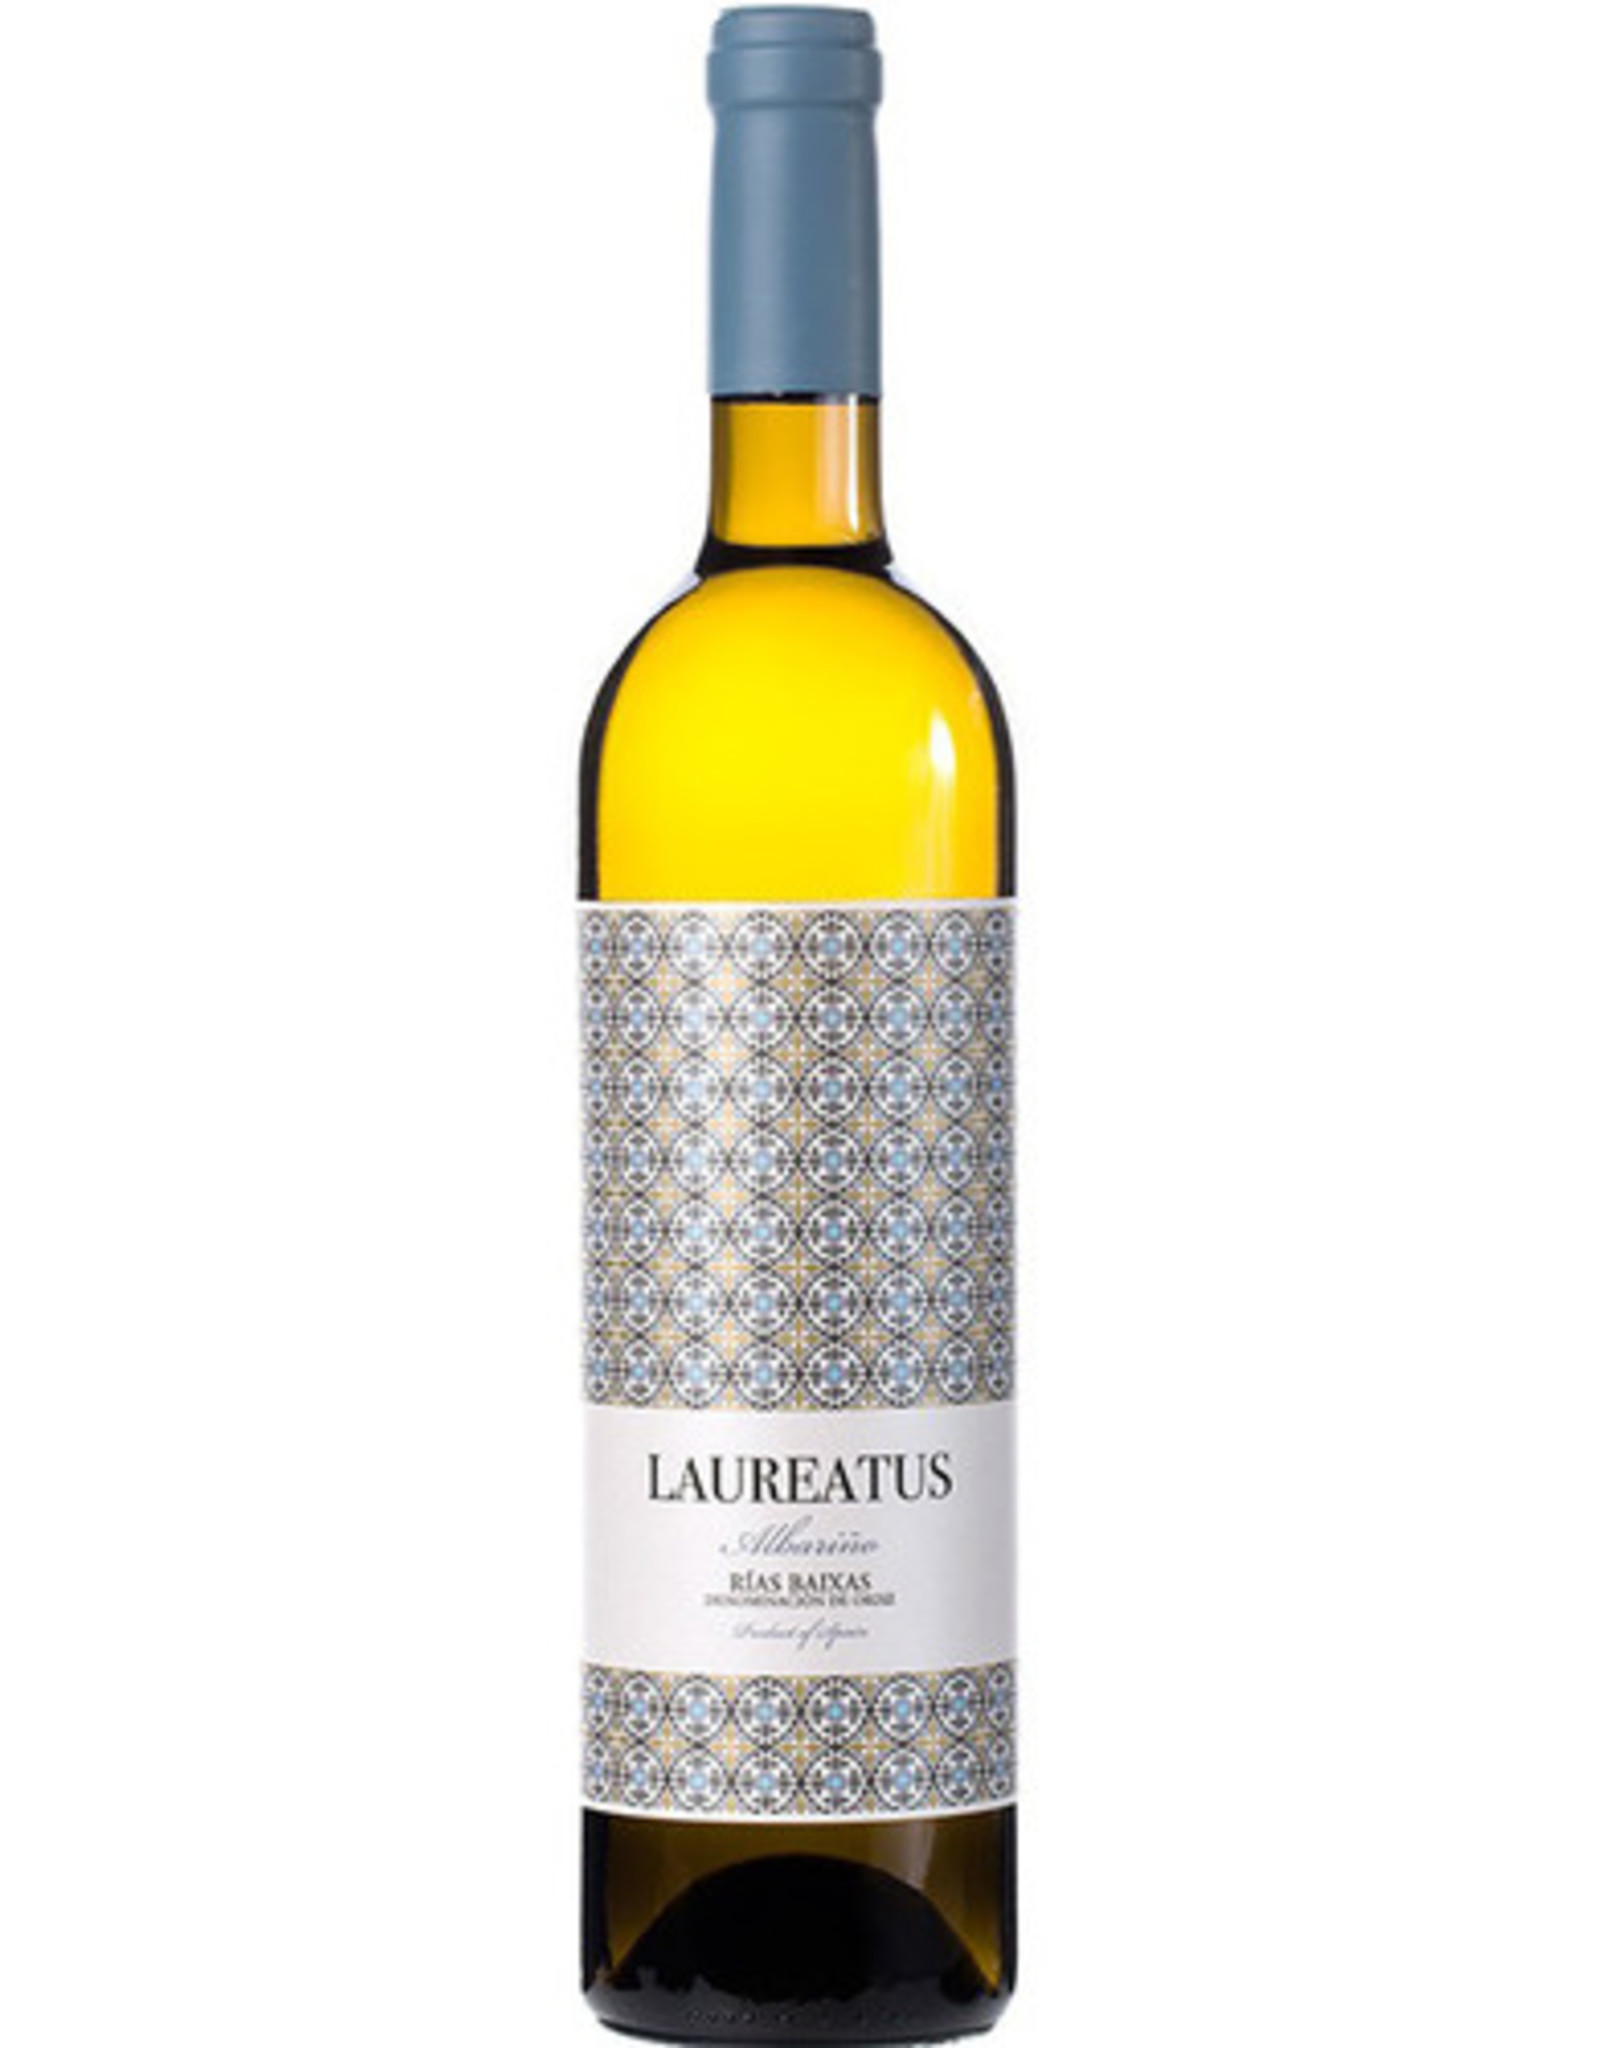 Spain Laureatus Albarino